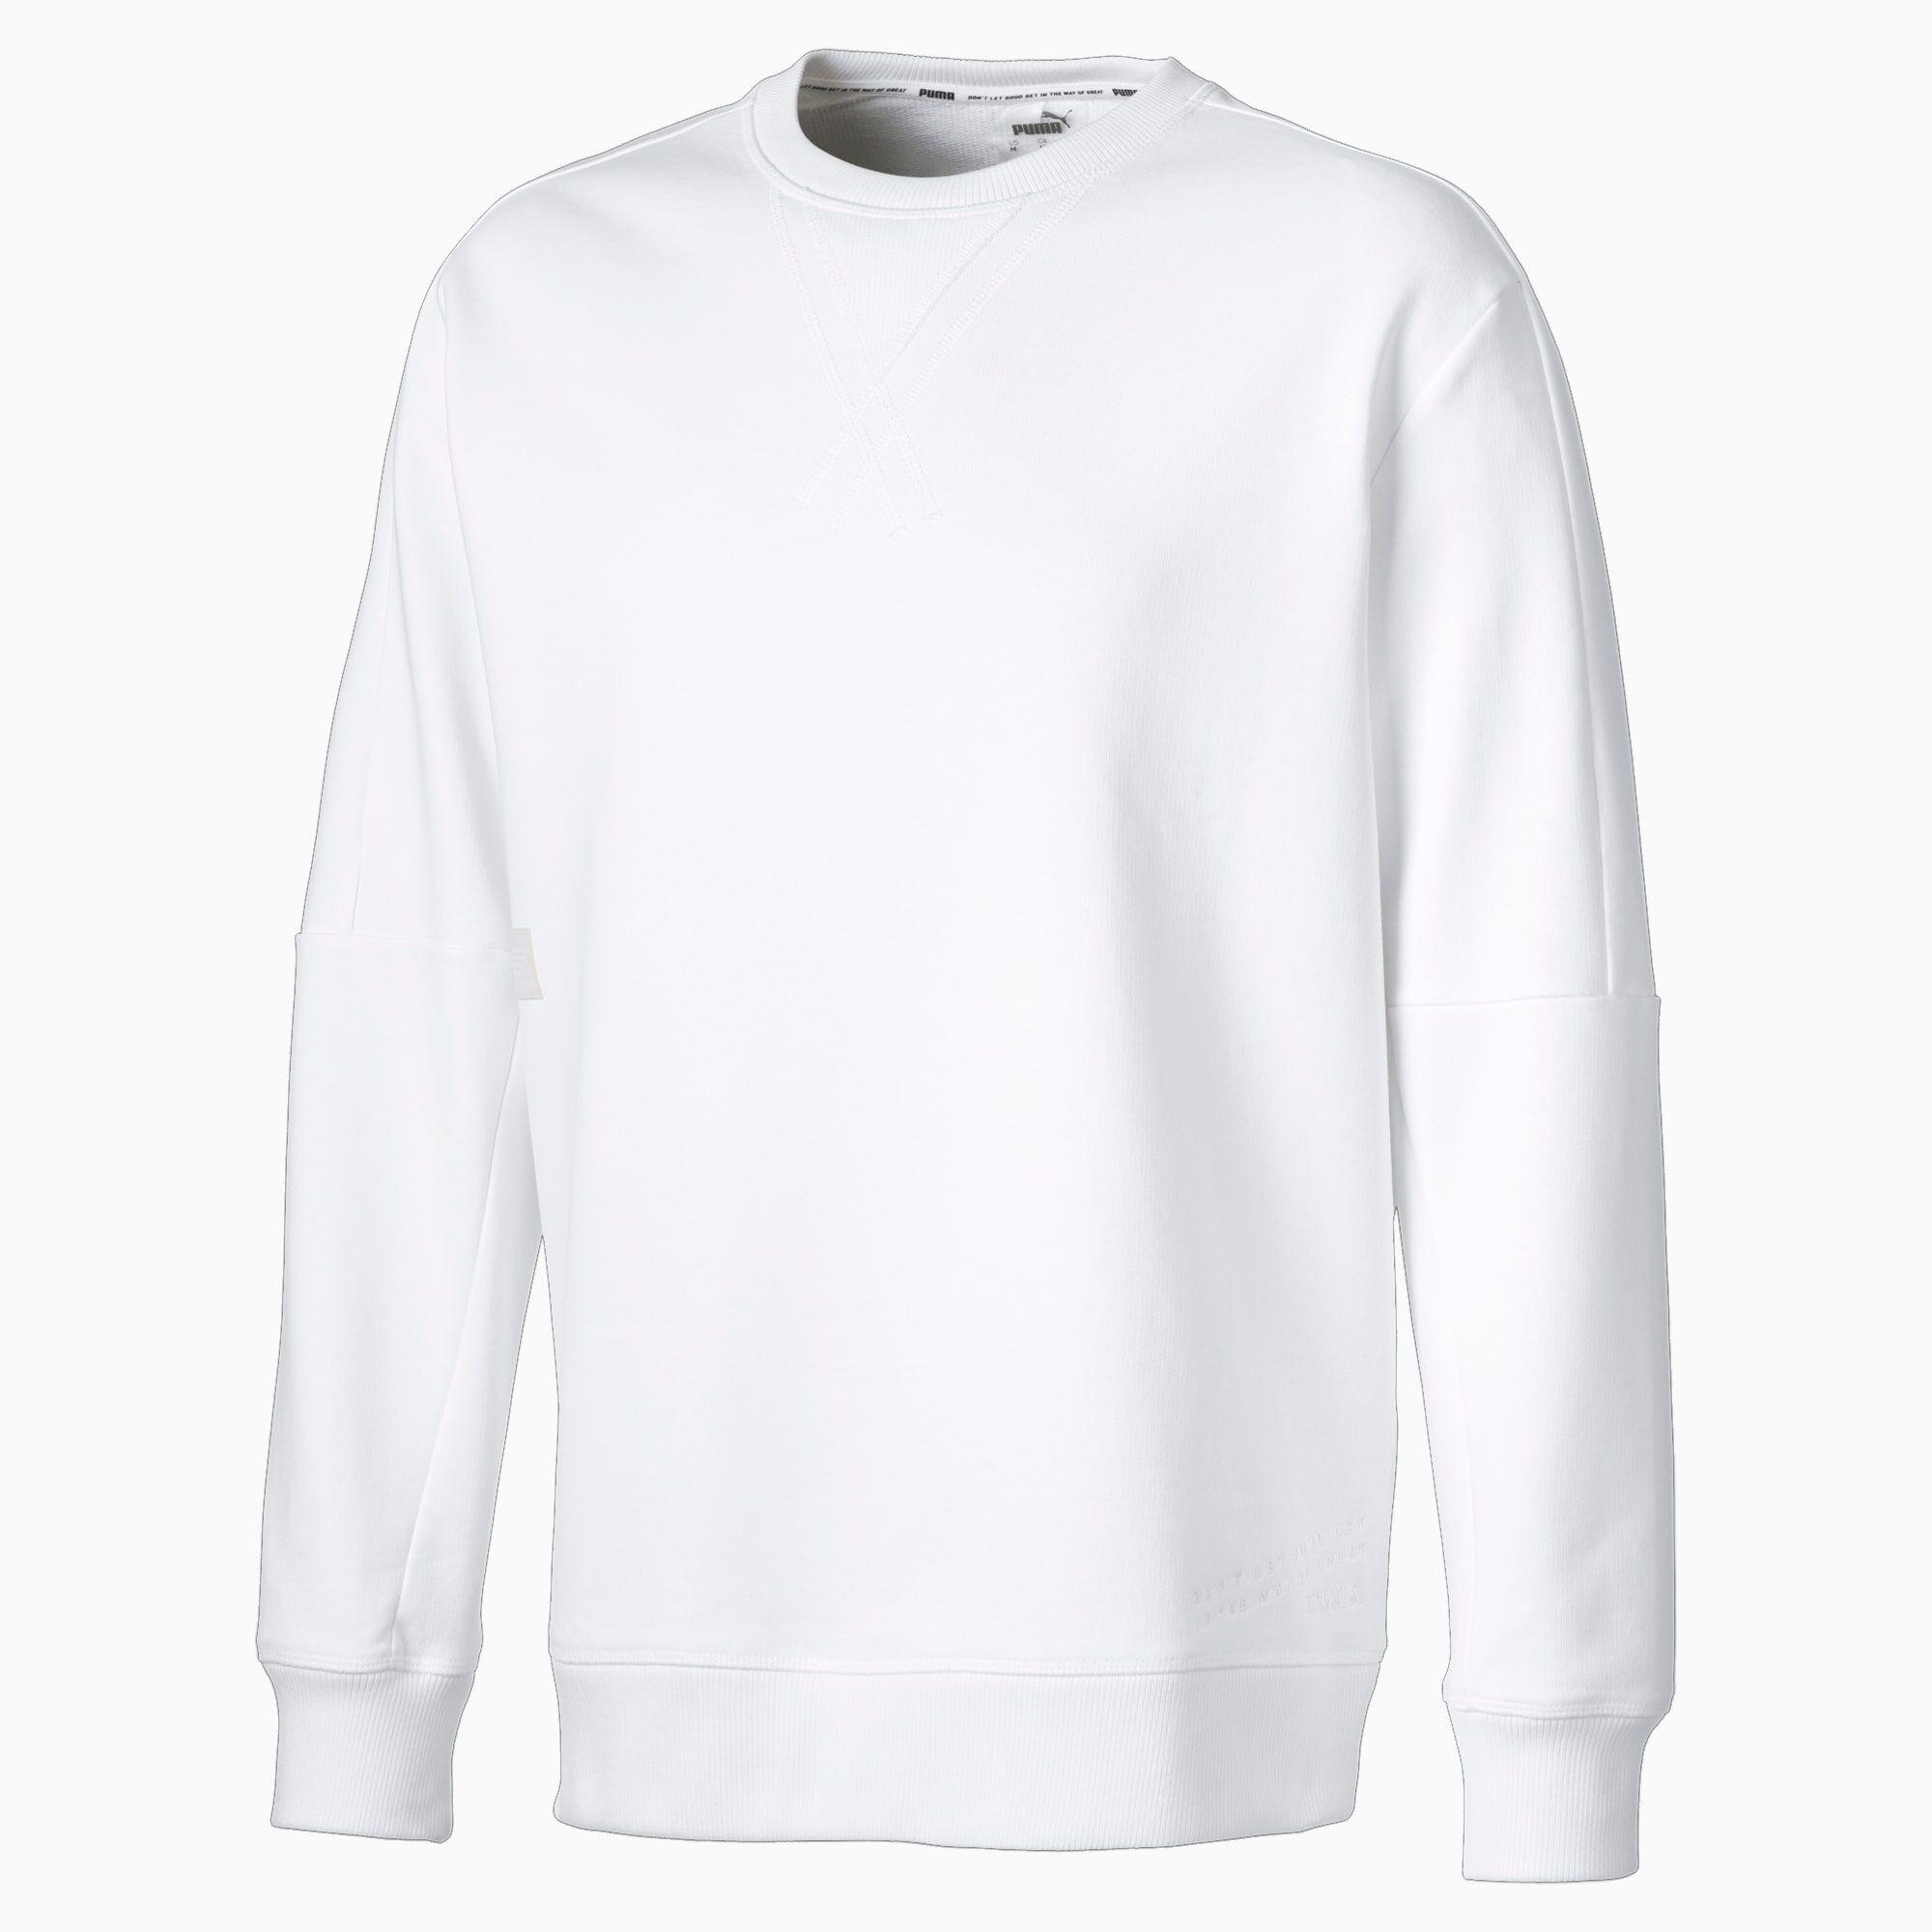 PUMA Sweat Jump Hook Basketball pour Homme, Blanc, Taille 3XL, Vêtements